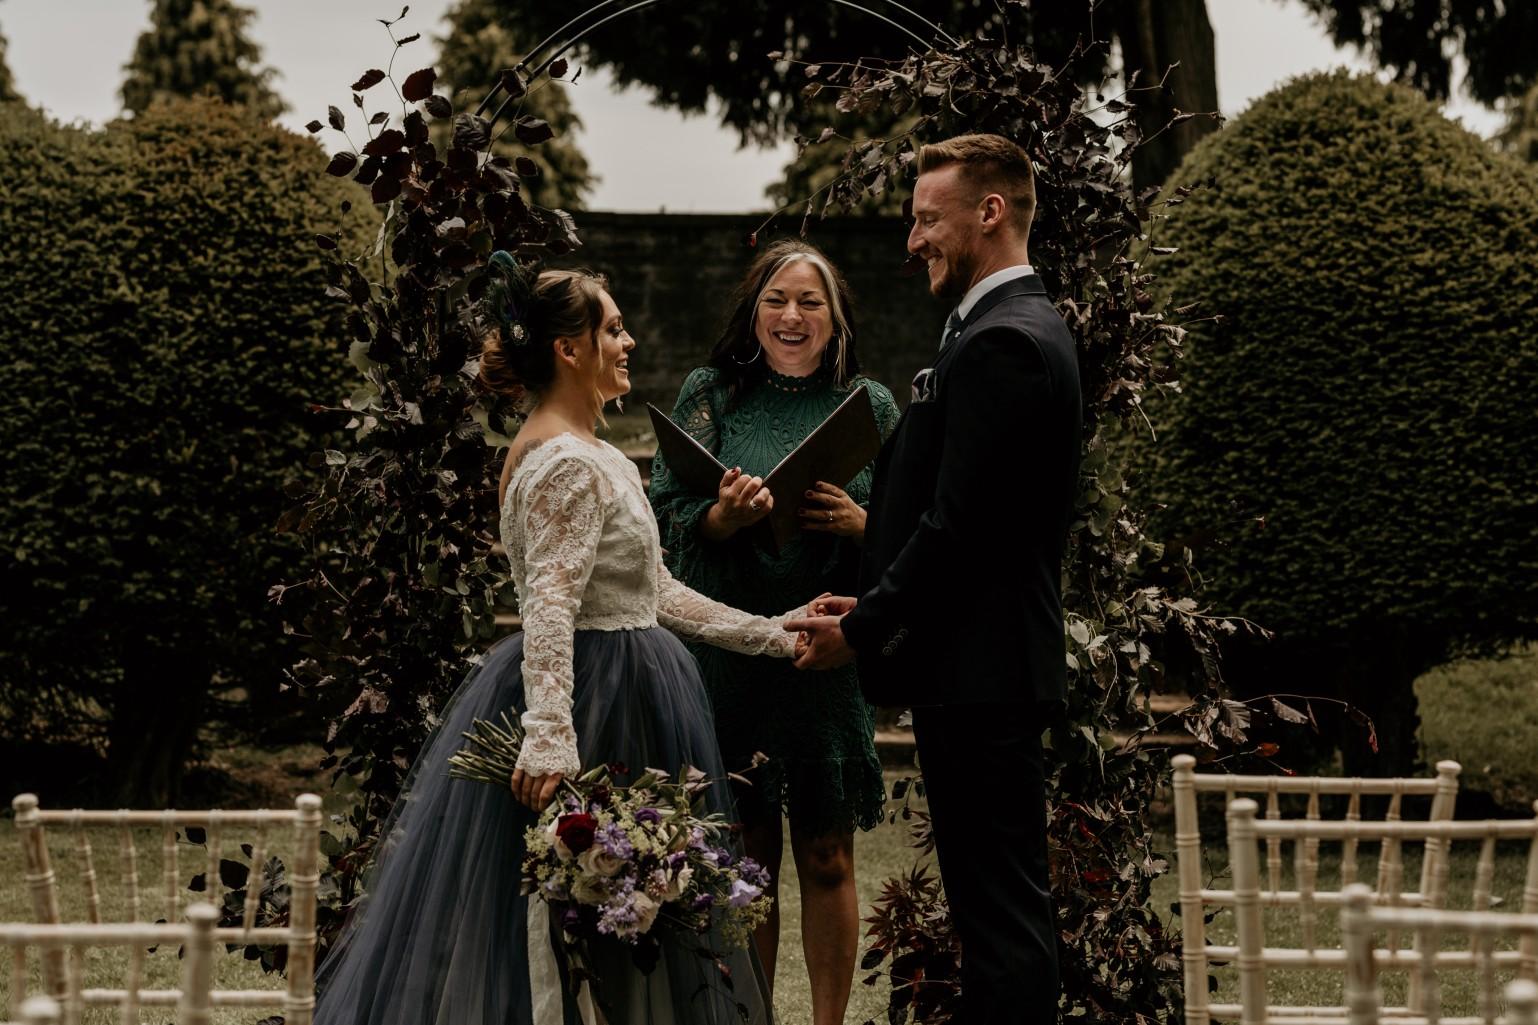 country garden wedding at newstead abbey - unique wedding ceremony - celebrant wedding ceremony - bohemian wedding ceremony